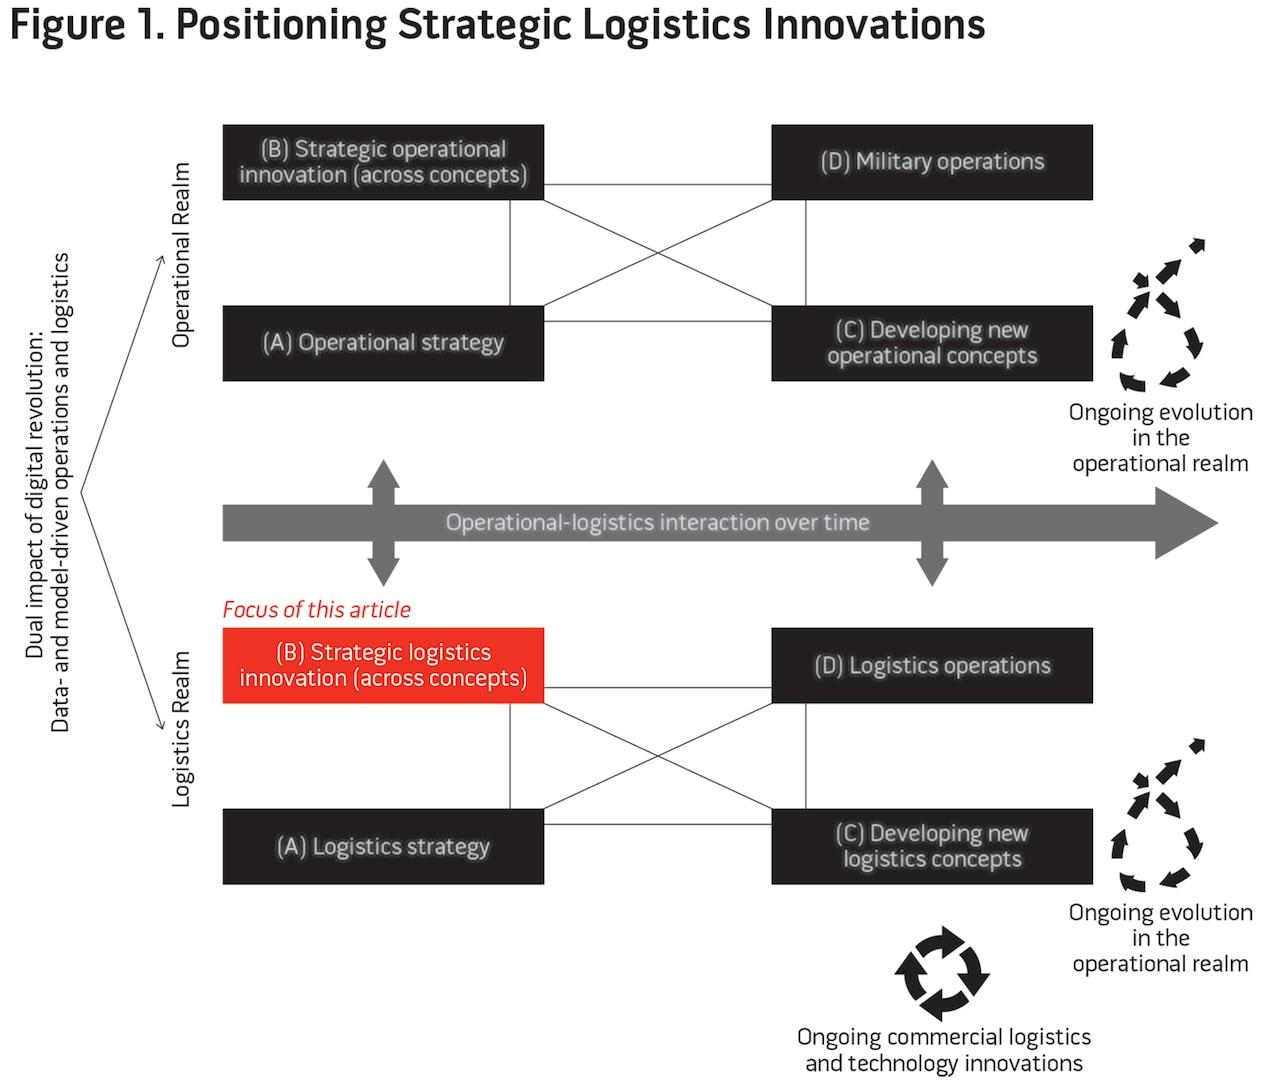 Figure 1. Positioning Strategic Logistics Innovations